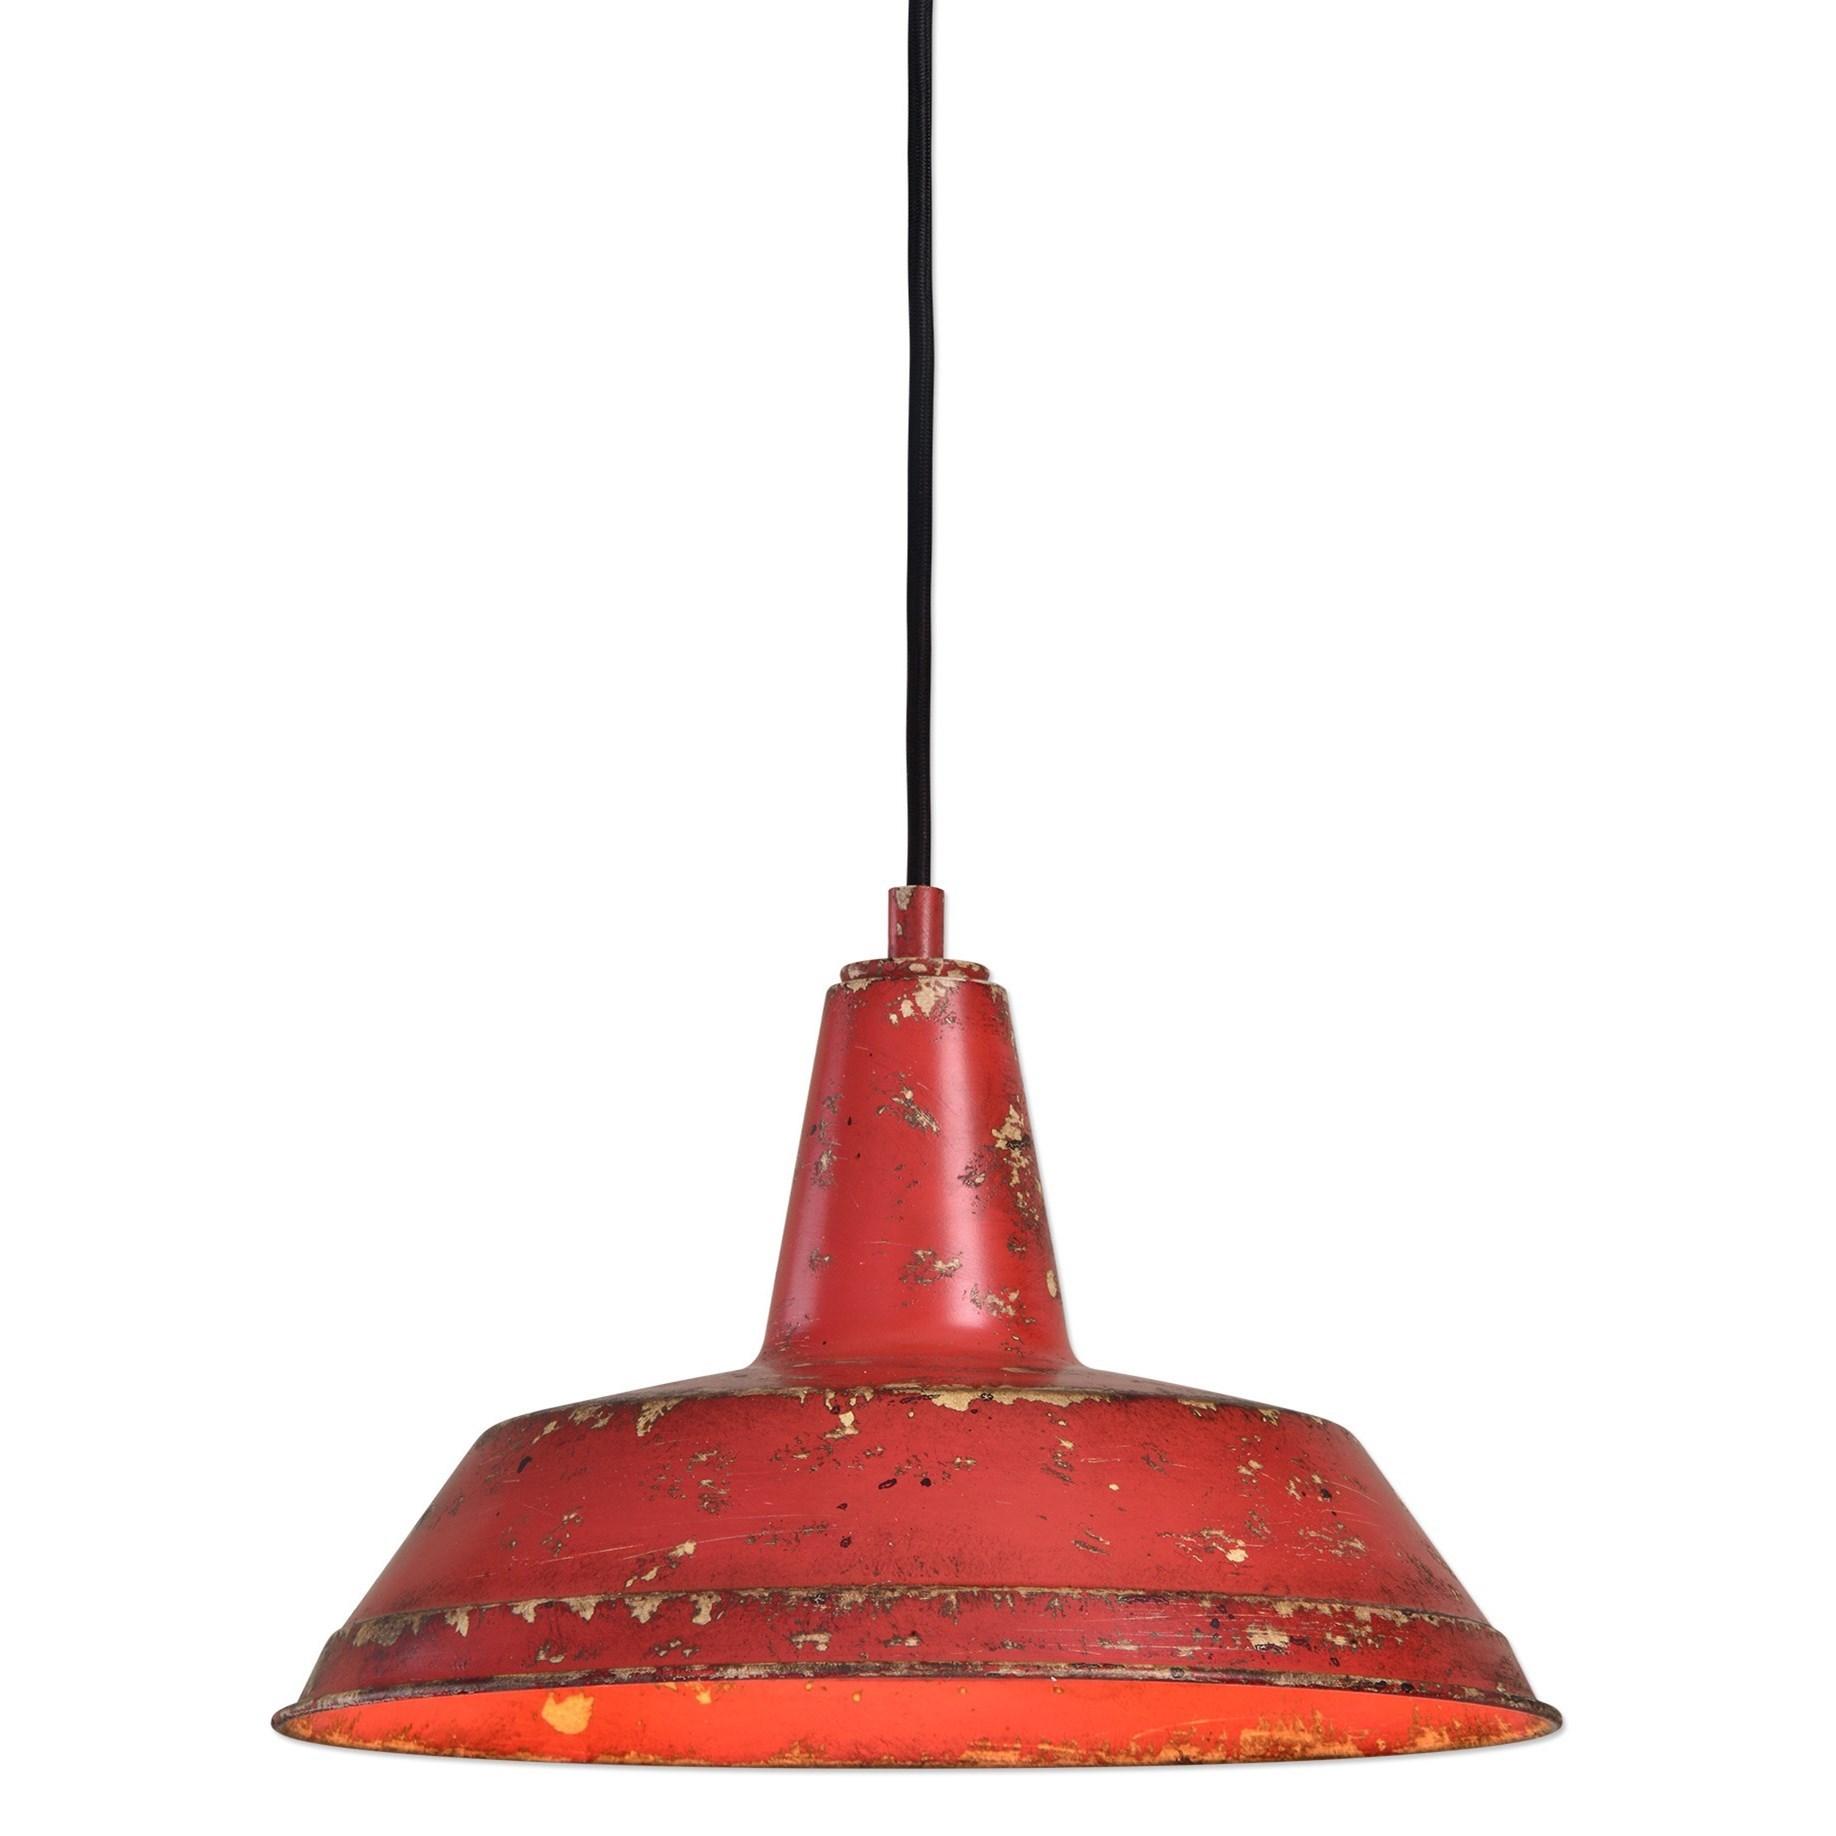 Uttermost Lighting Fixtures Pomodoro 1 Light Distressed Pendant - Item Number: 22088